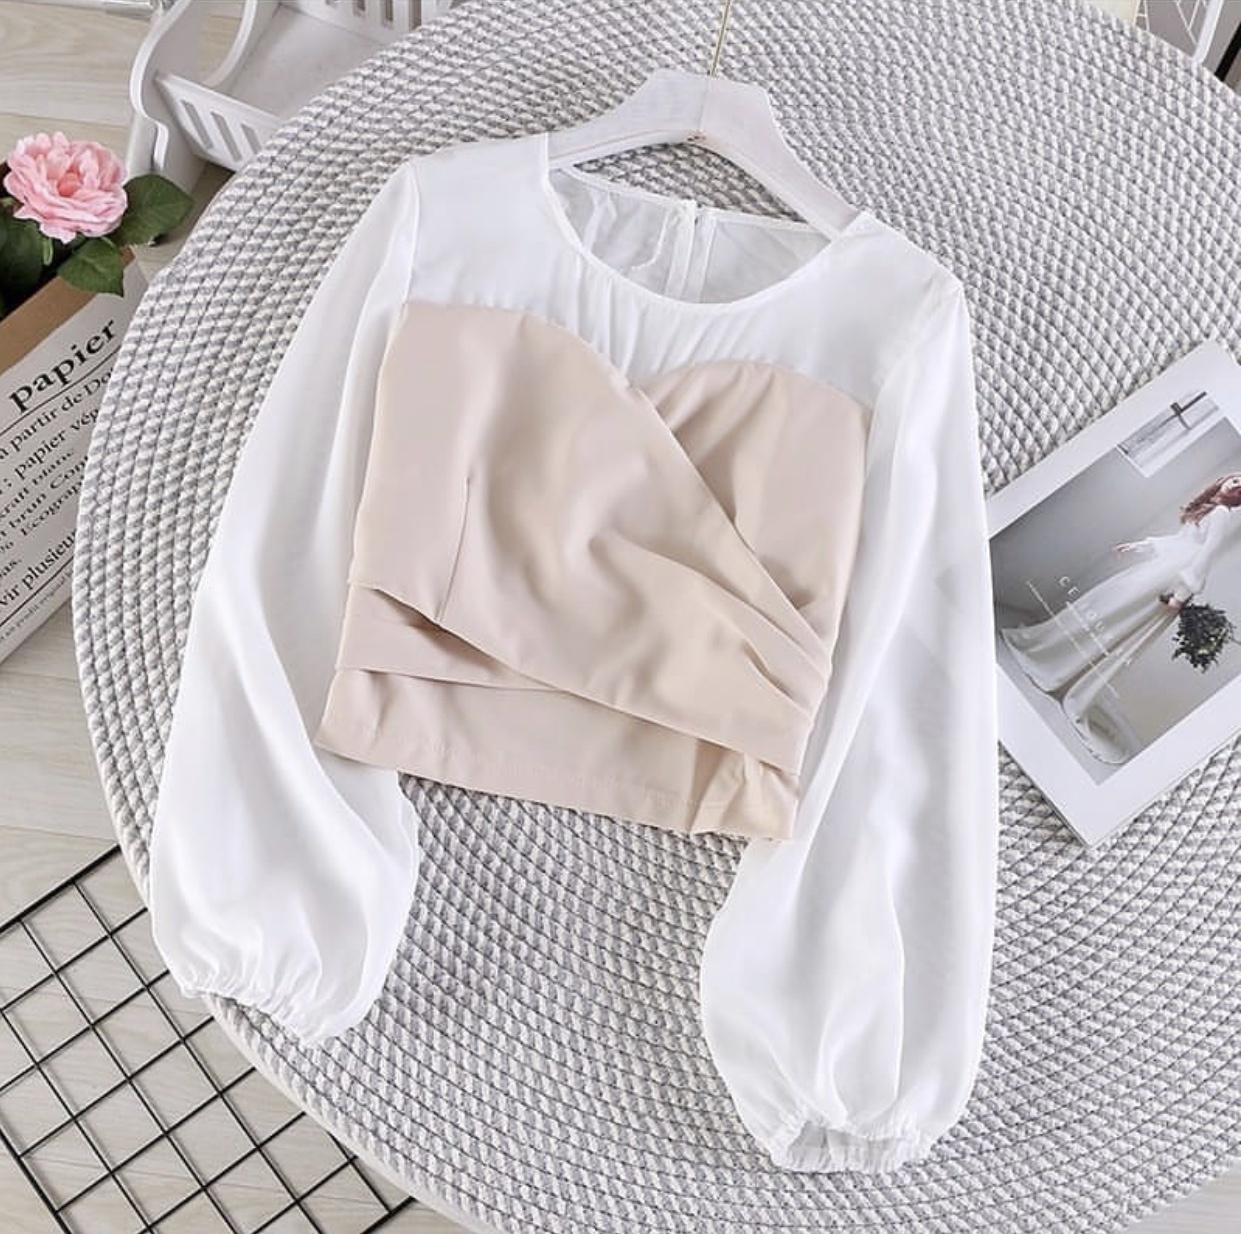 zz larisstore kiora blouse blouse wanita / atasan wanita / fashion wanita / blouse korea / top wanita / baju kekinian / atasan  / atasan wanita  / blouse  / dress wanita / dress  wanita / dress korea